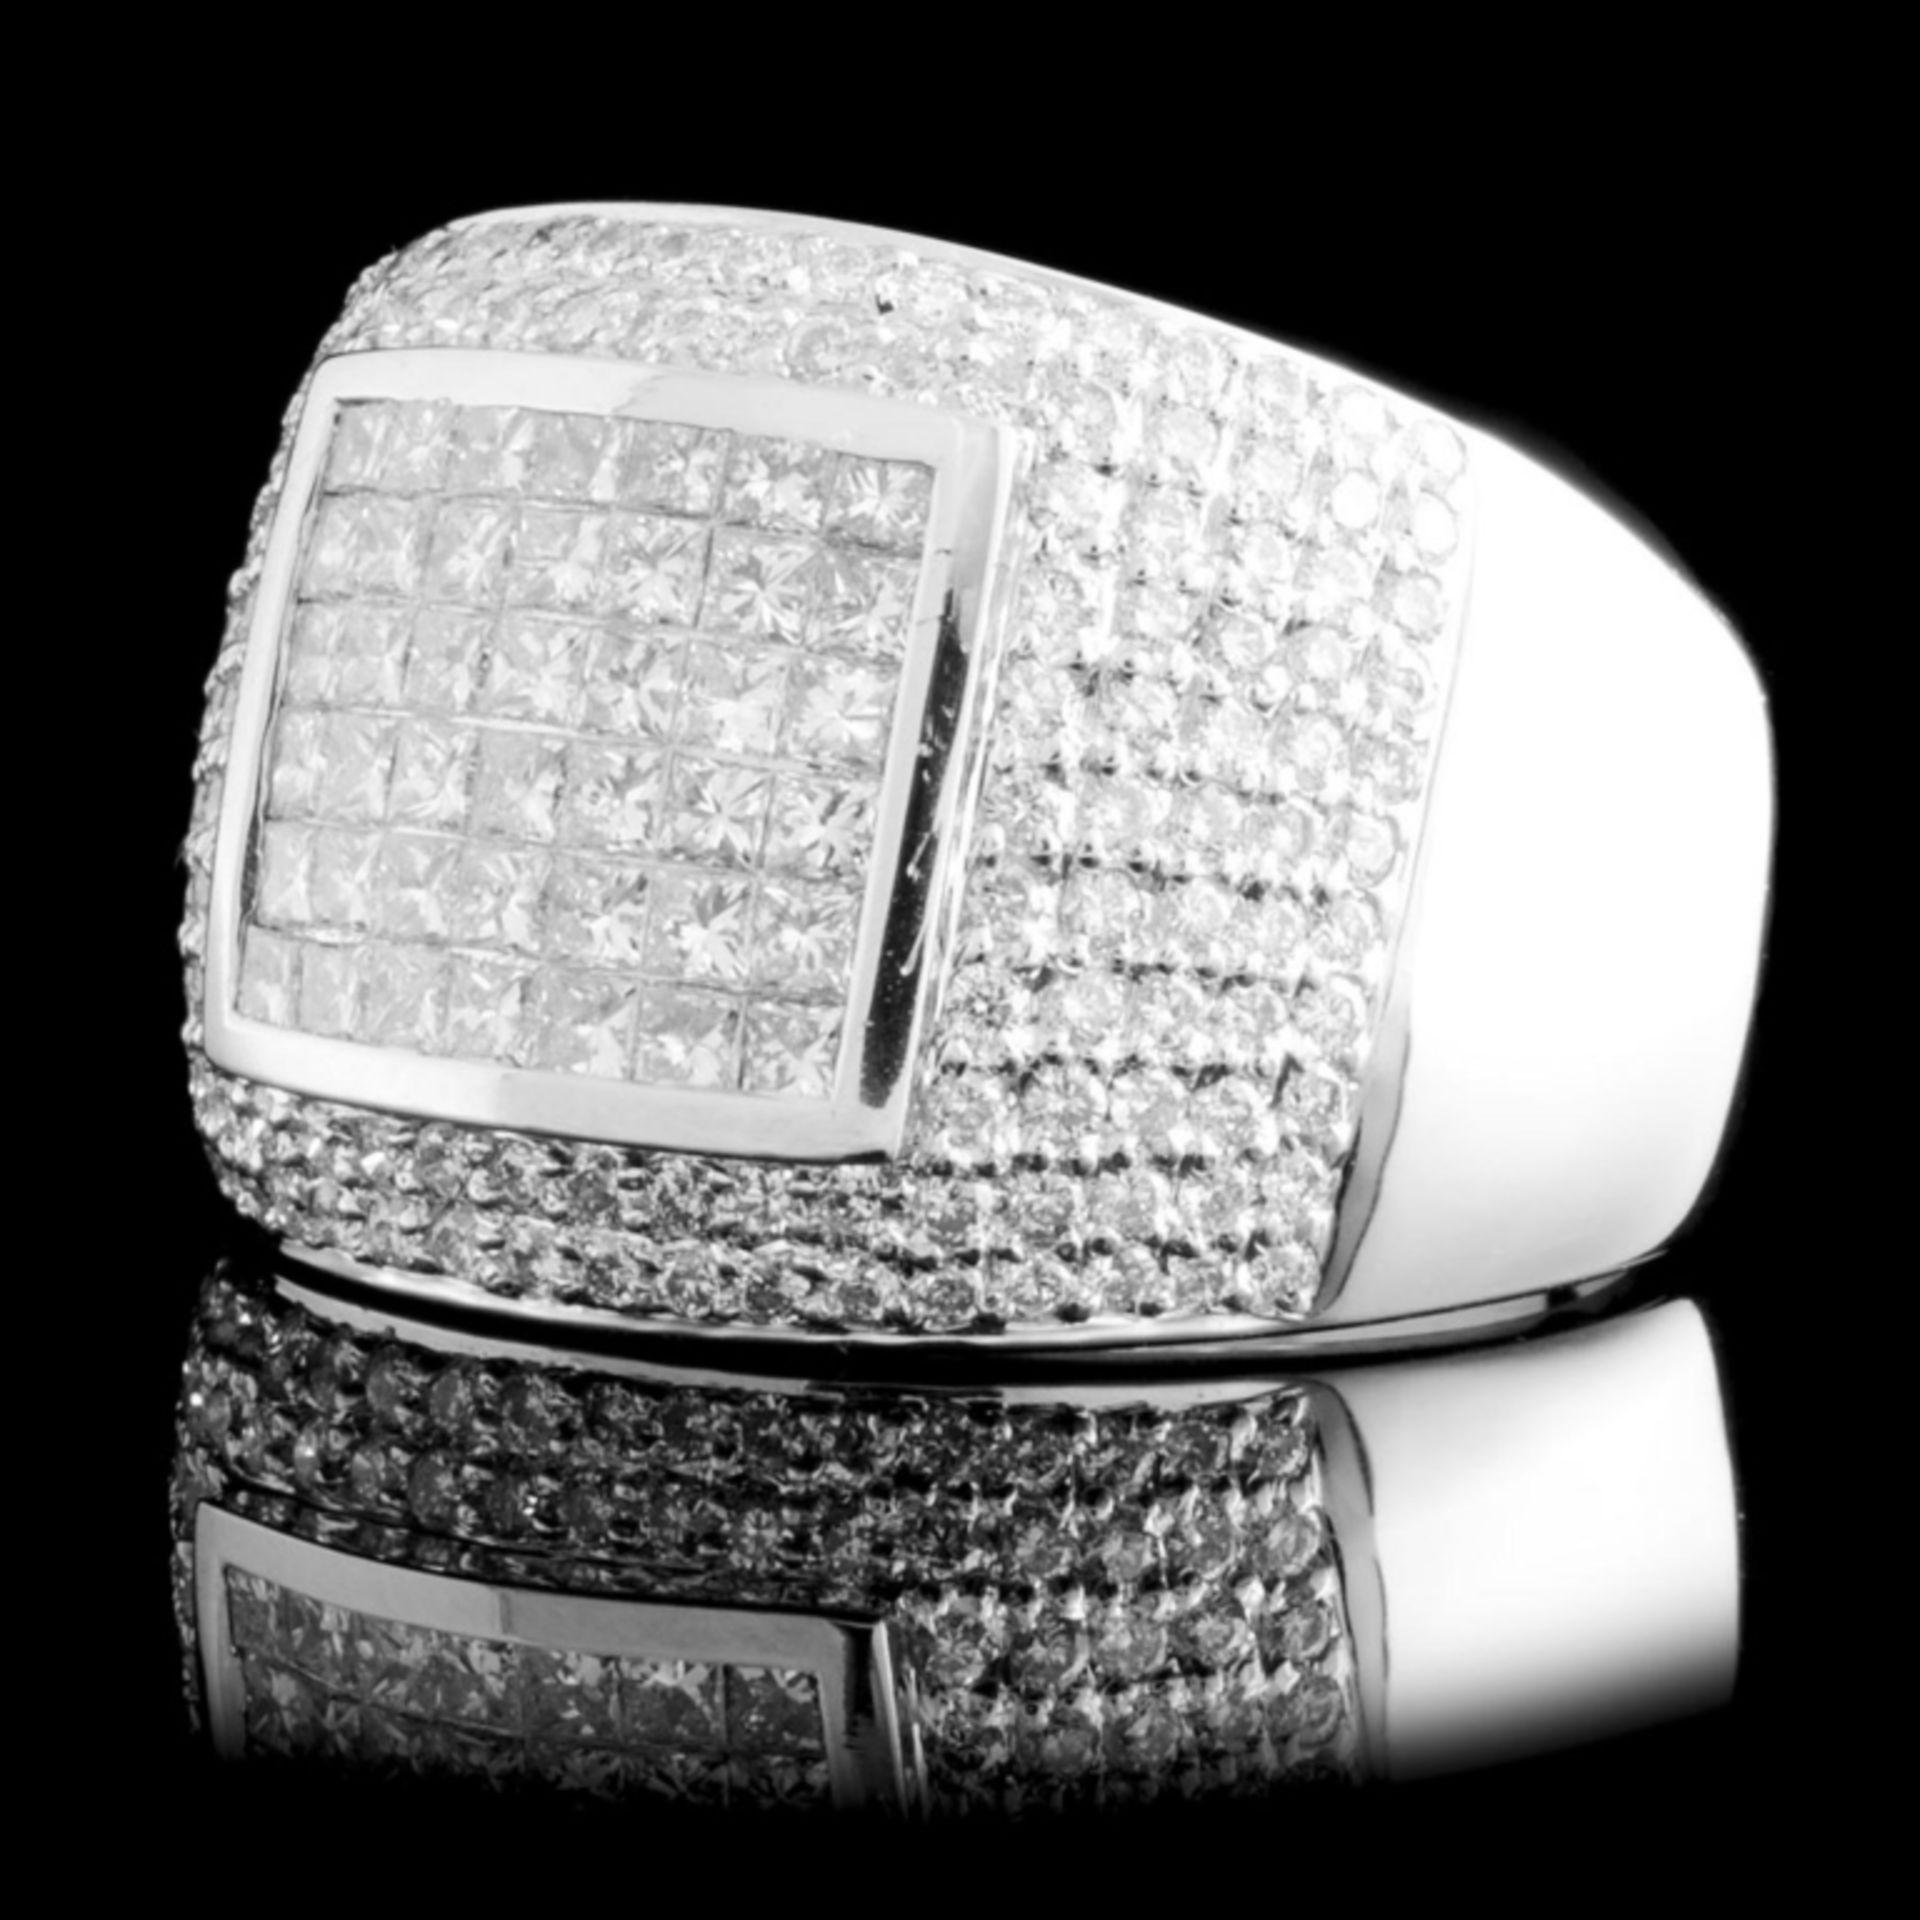 18K Gold 1.55ctw Diamond Ring - Image 2 of 4